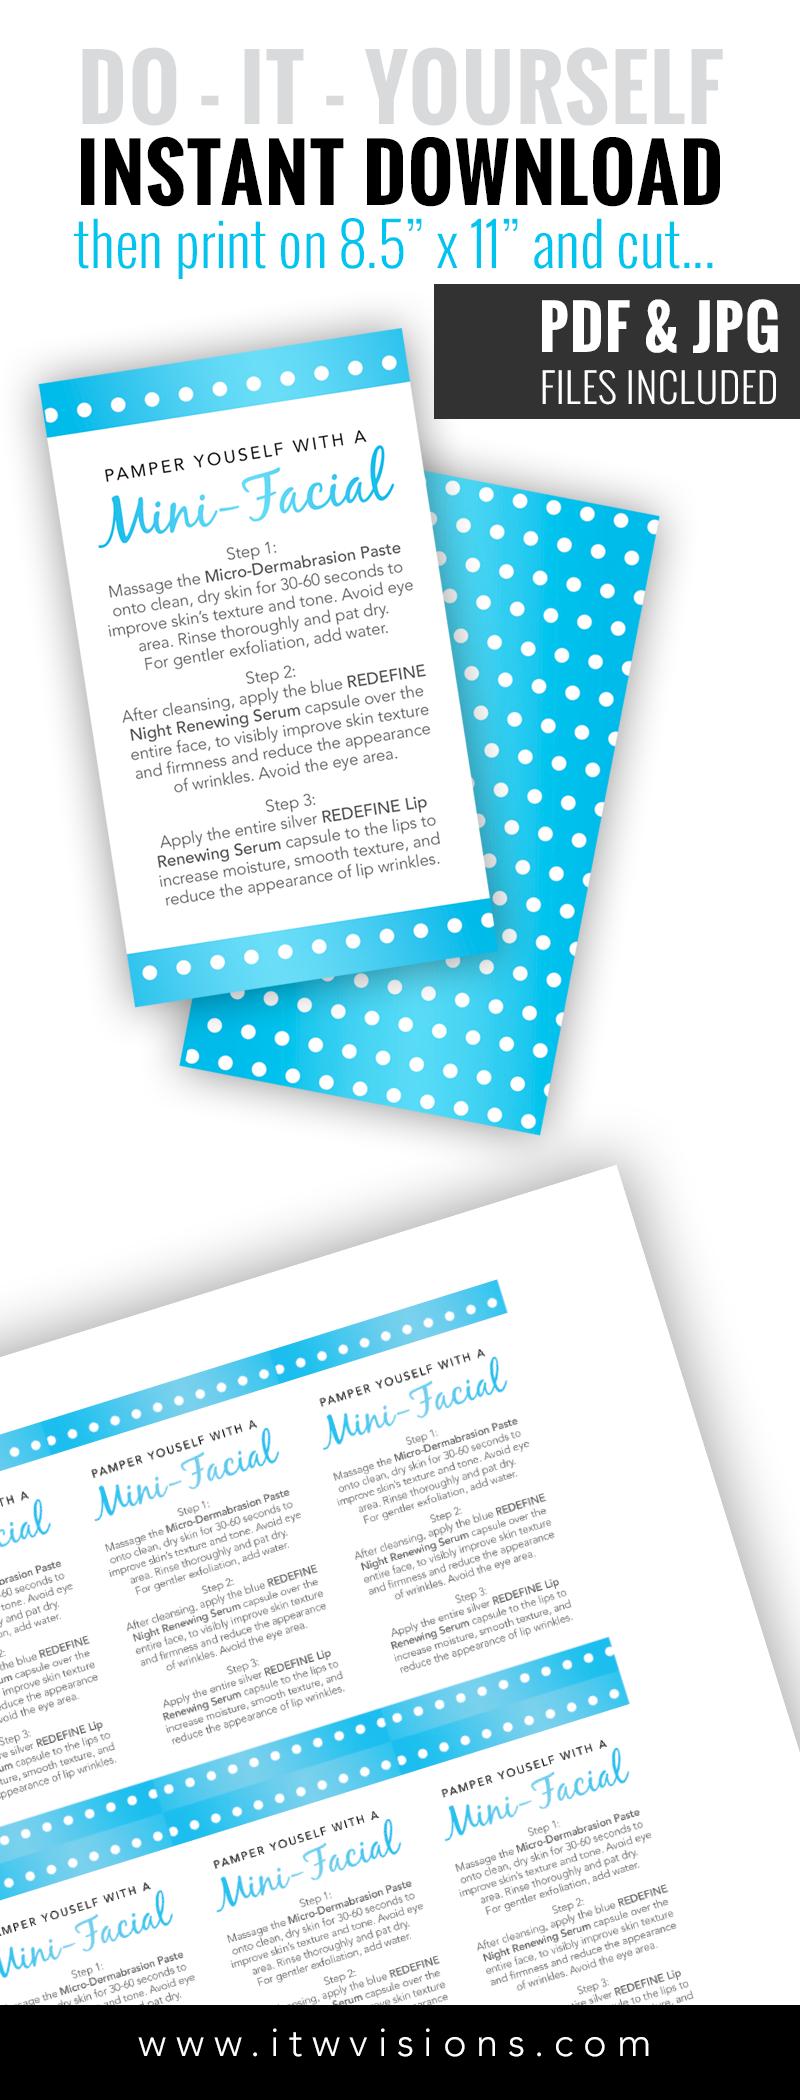 Editable Pdf - Mini-Facial Card - Blue Pearl - Instant Download - Rodan And Fields Mini Facial Instructions Printable Free